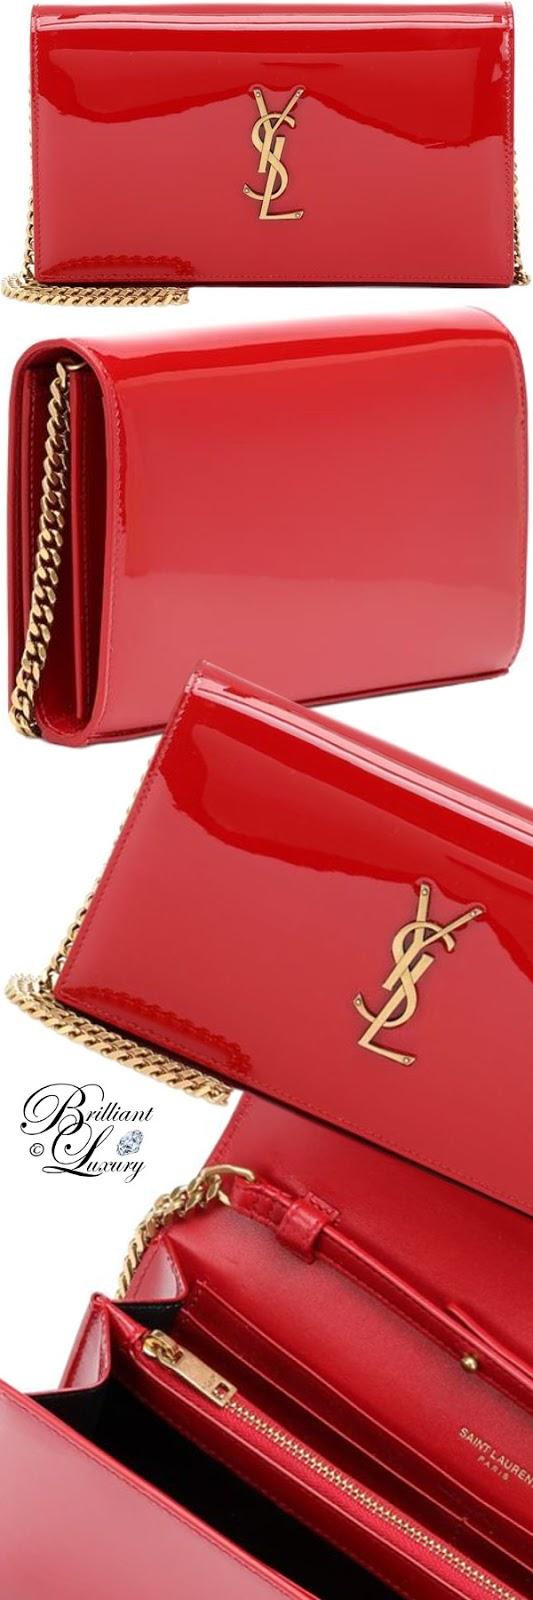 Brilliant Luxury ♦ PANTONE Fashion Color SS 2019 ~ Fiesta ♦ Saint Laurent Kate wallet leather shoulder bag #red